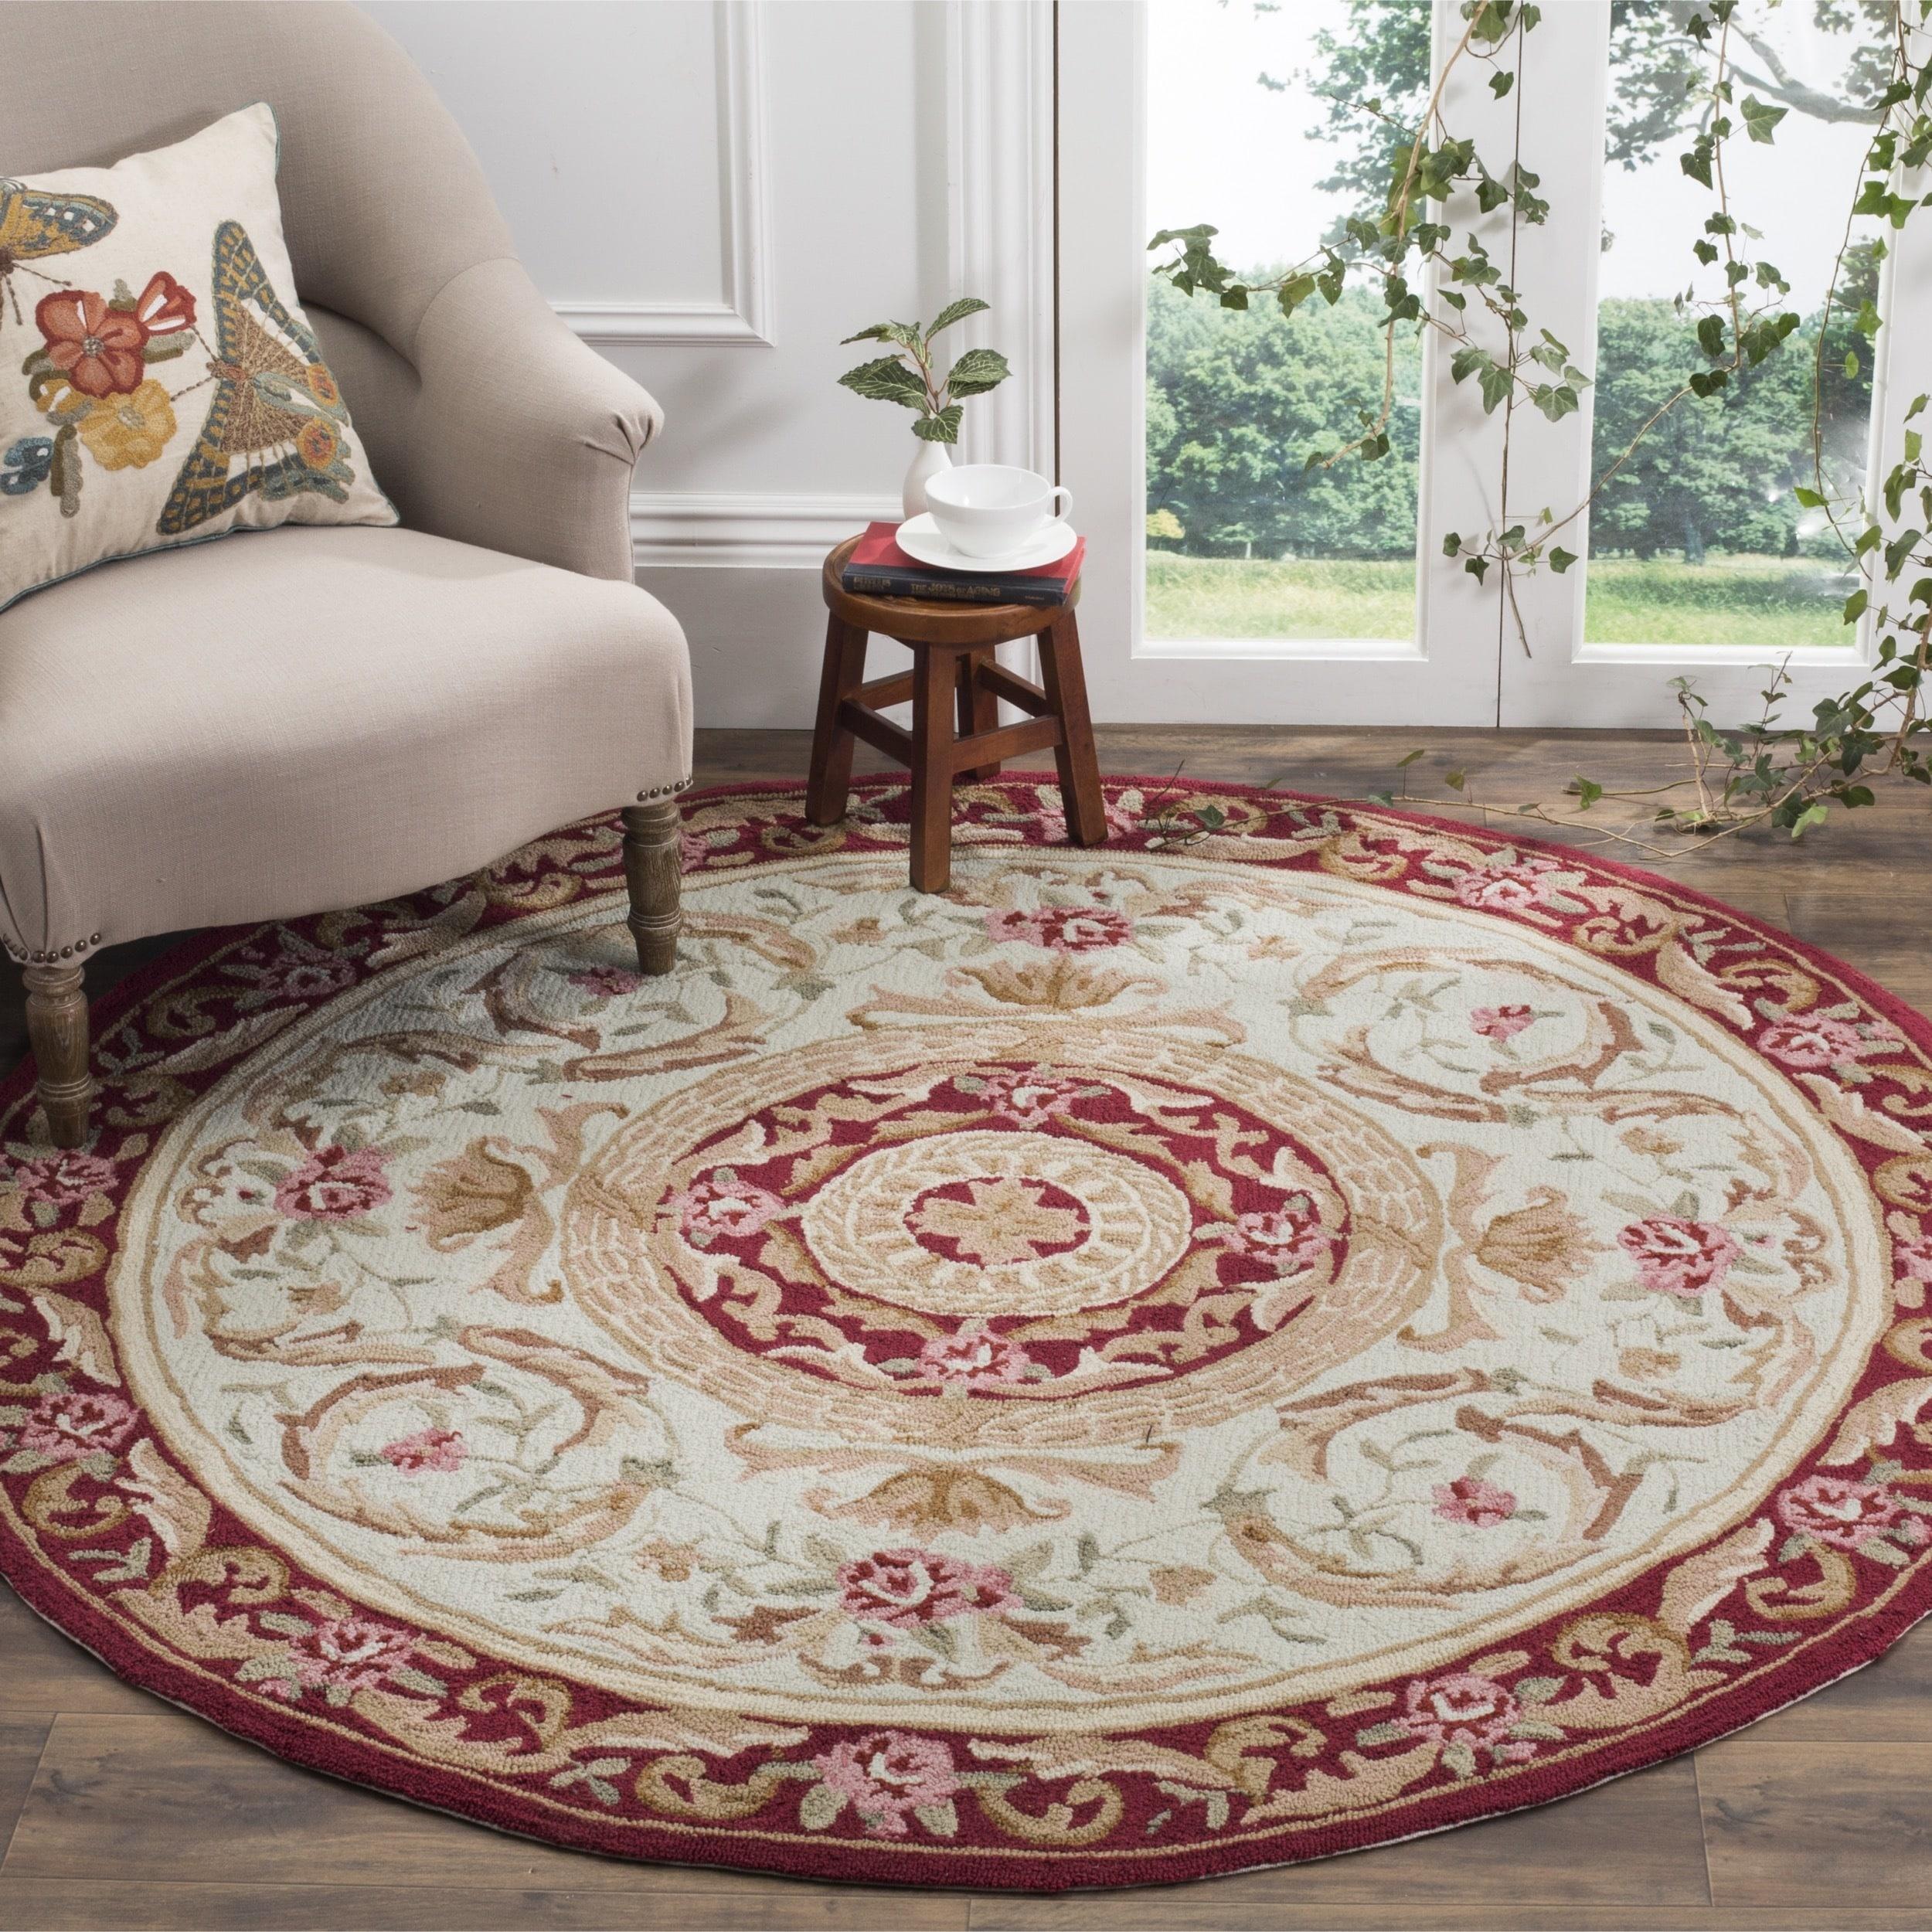 Safavieh hand hooked easy care aubusson ivory burgundy rug 8 round 8 x 8 round